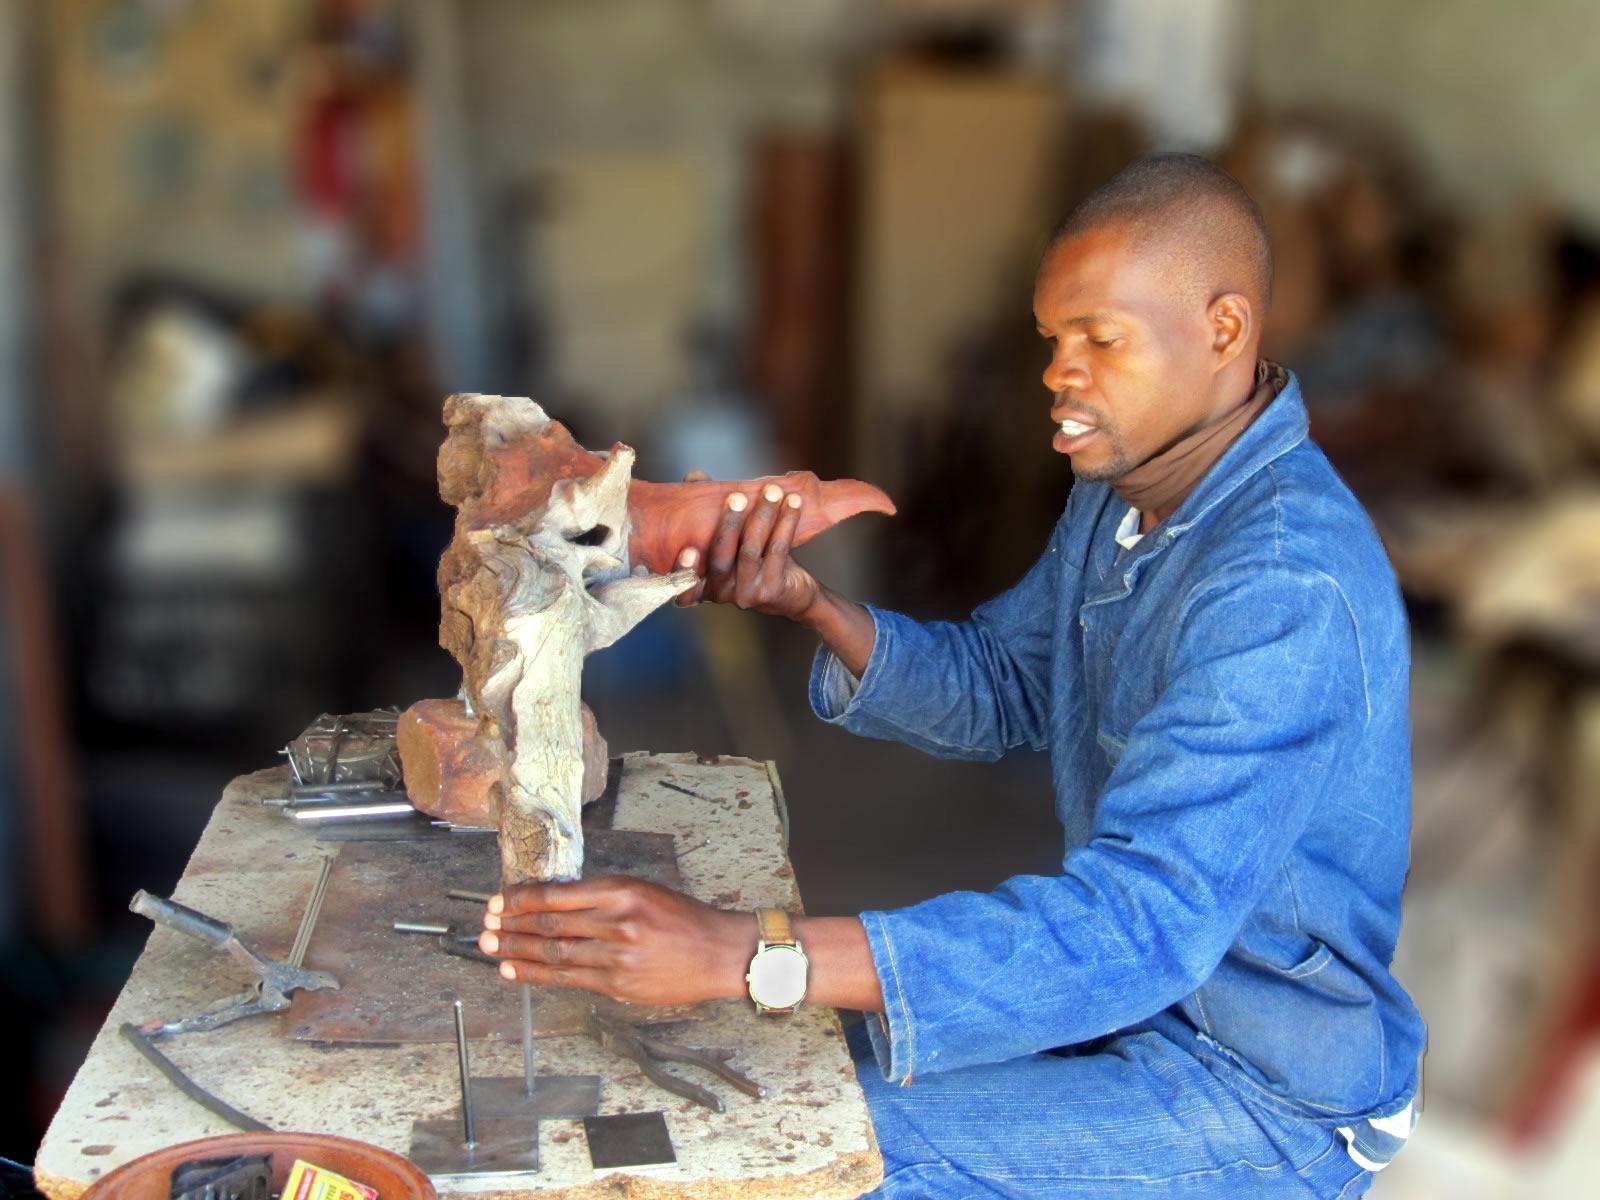 Boniface Chikwinhere creating wooden sculpture